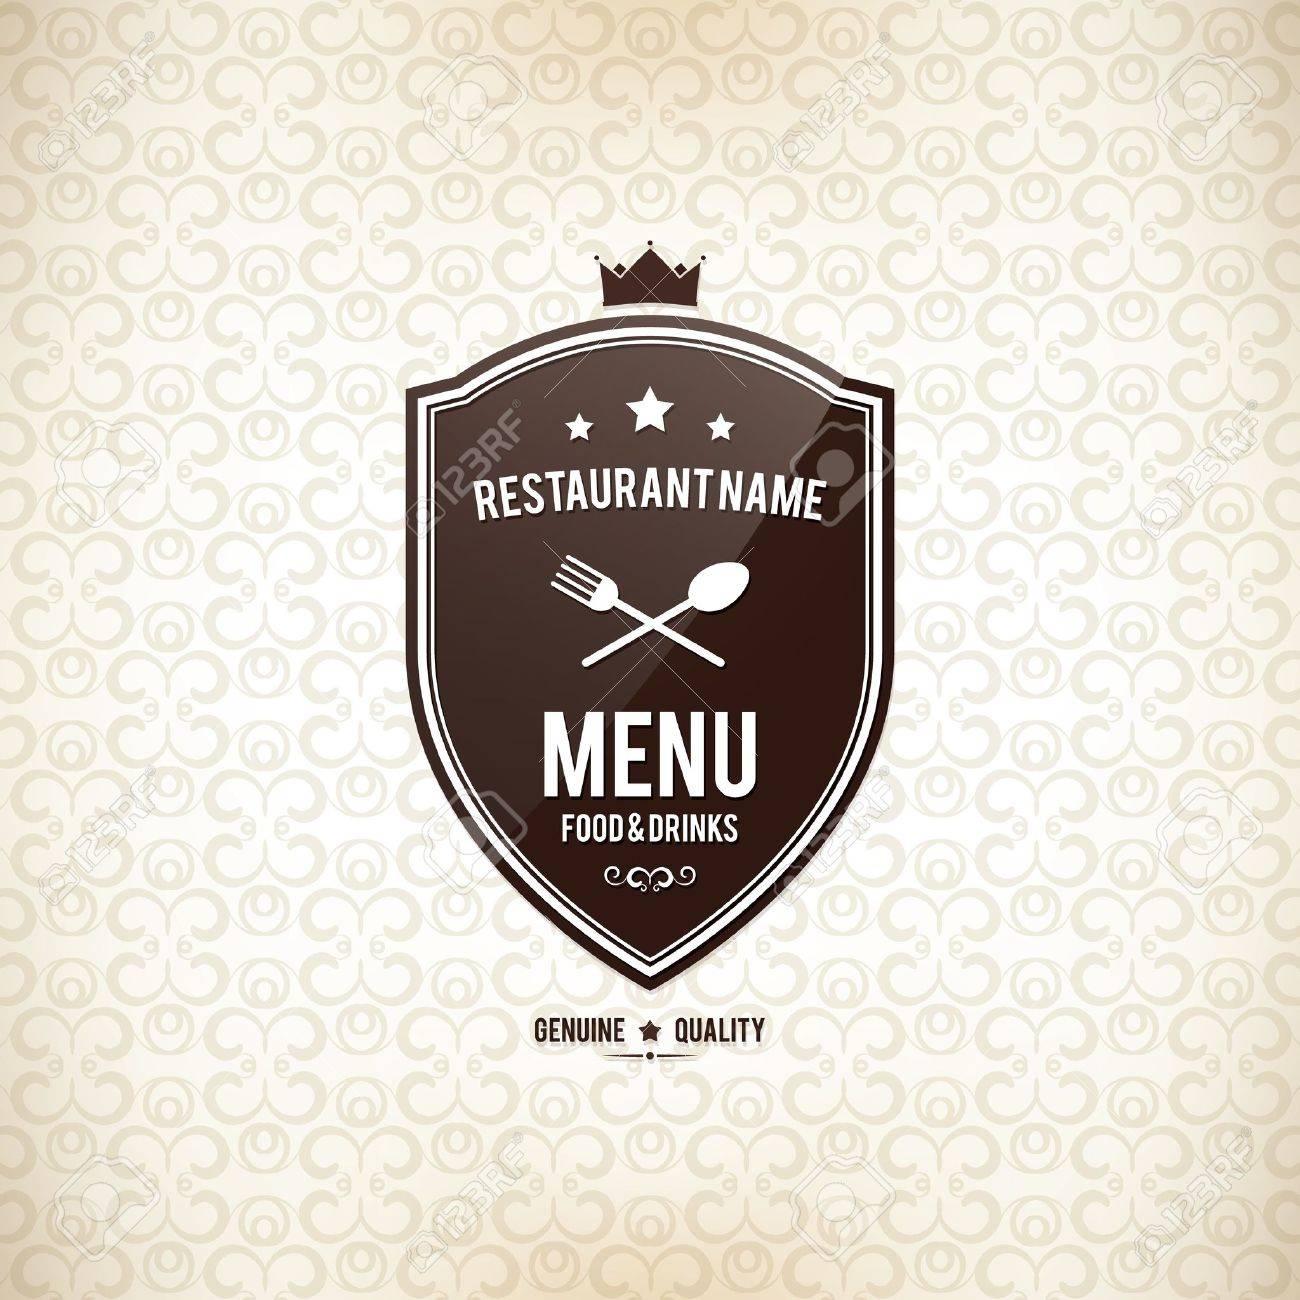 Restaurant menu design Stock Vector - 18575427